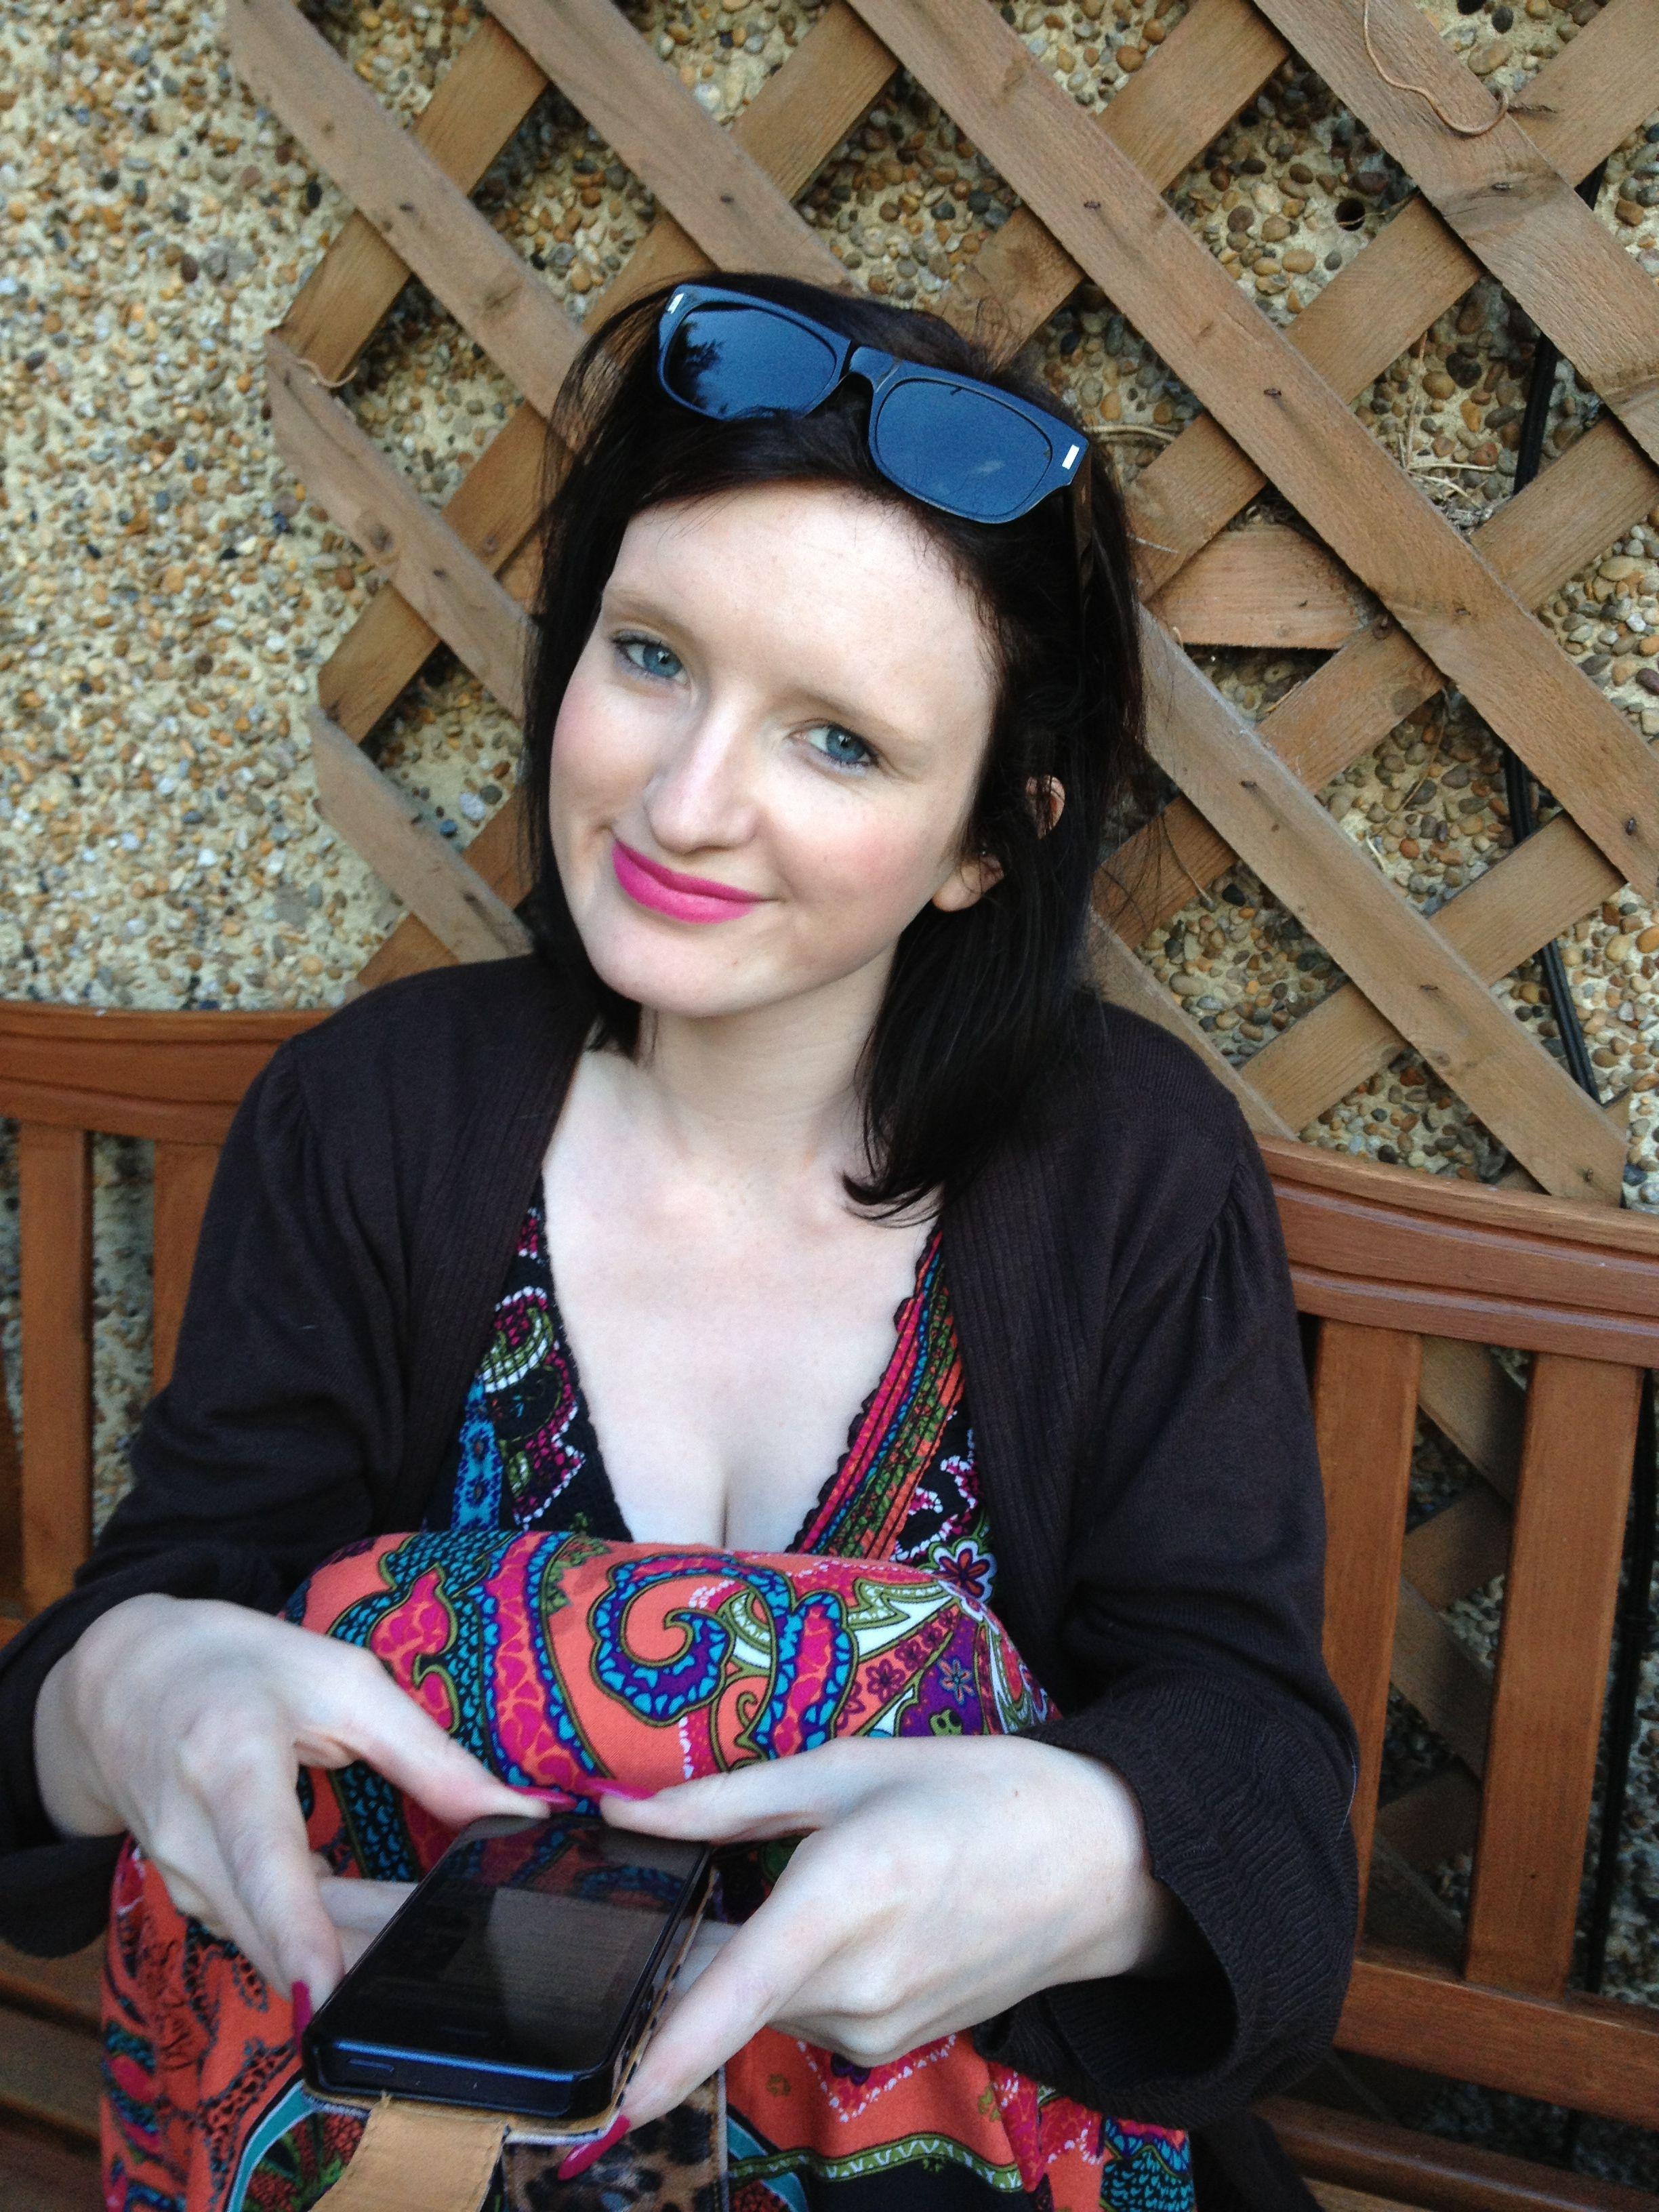 Mrs Jewel Xxx Stunning the most beautiful girl in the world - my baba jewel adlington xxx